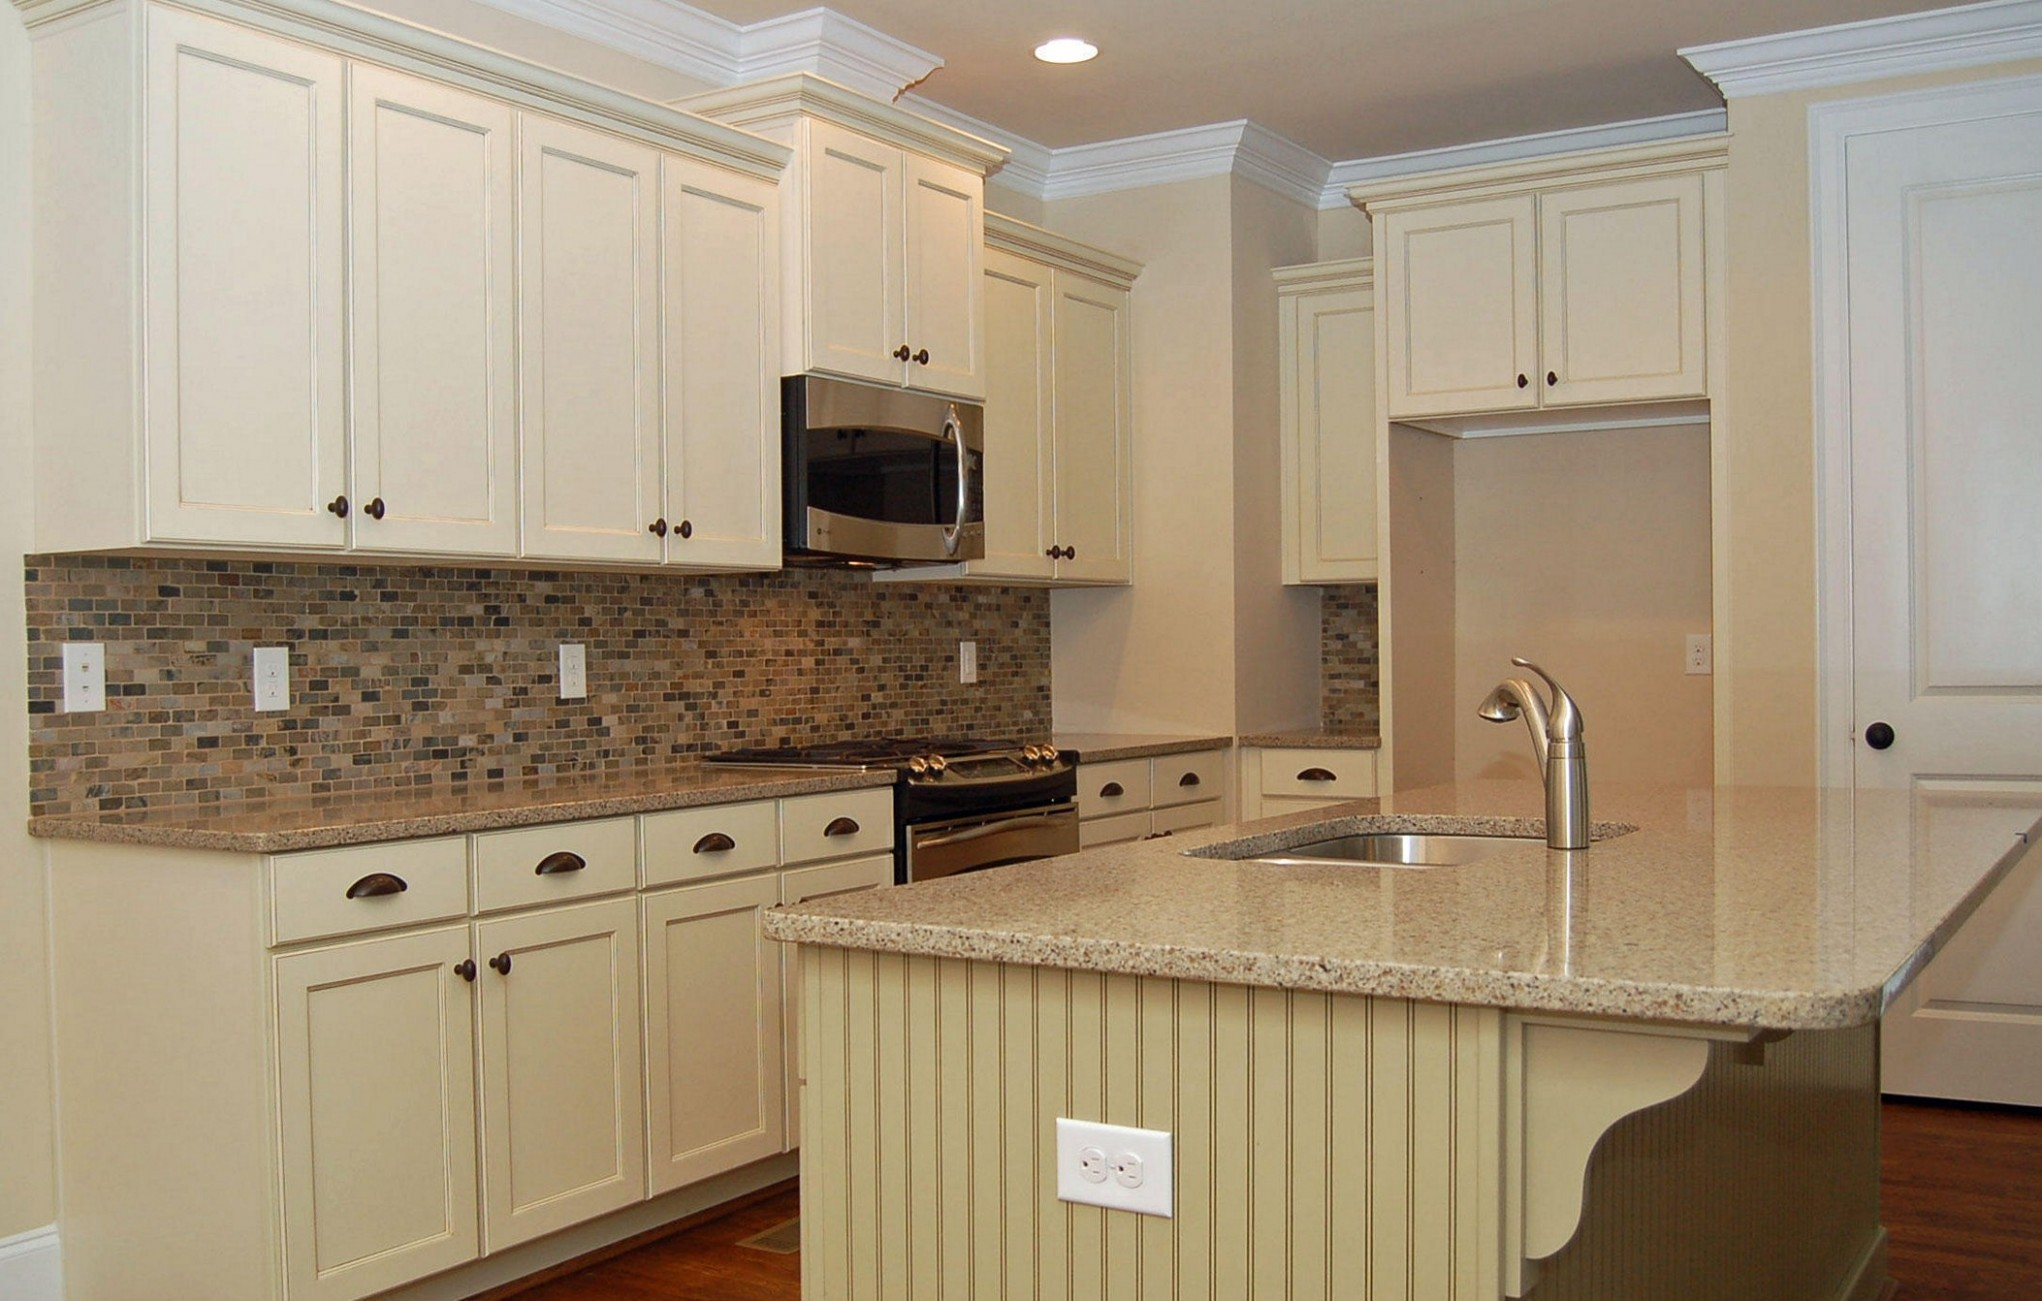 Antique White Kitchen Cabinets With Granite Countertops How To  - Antique White Kitchen Cabinets With Granite Countertops